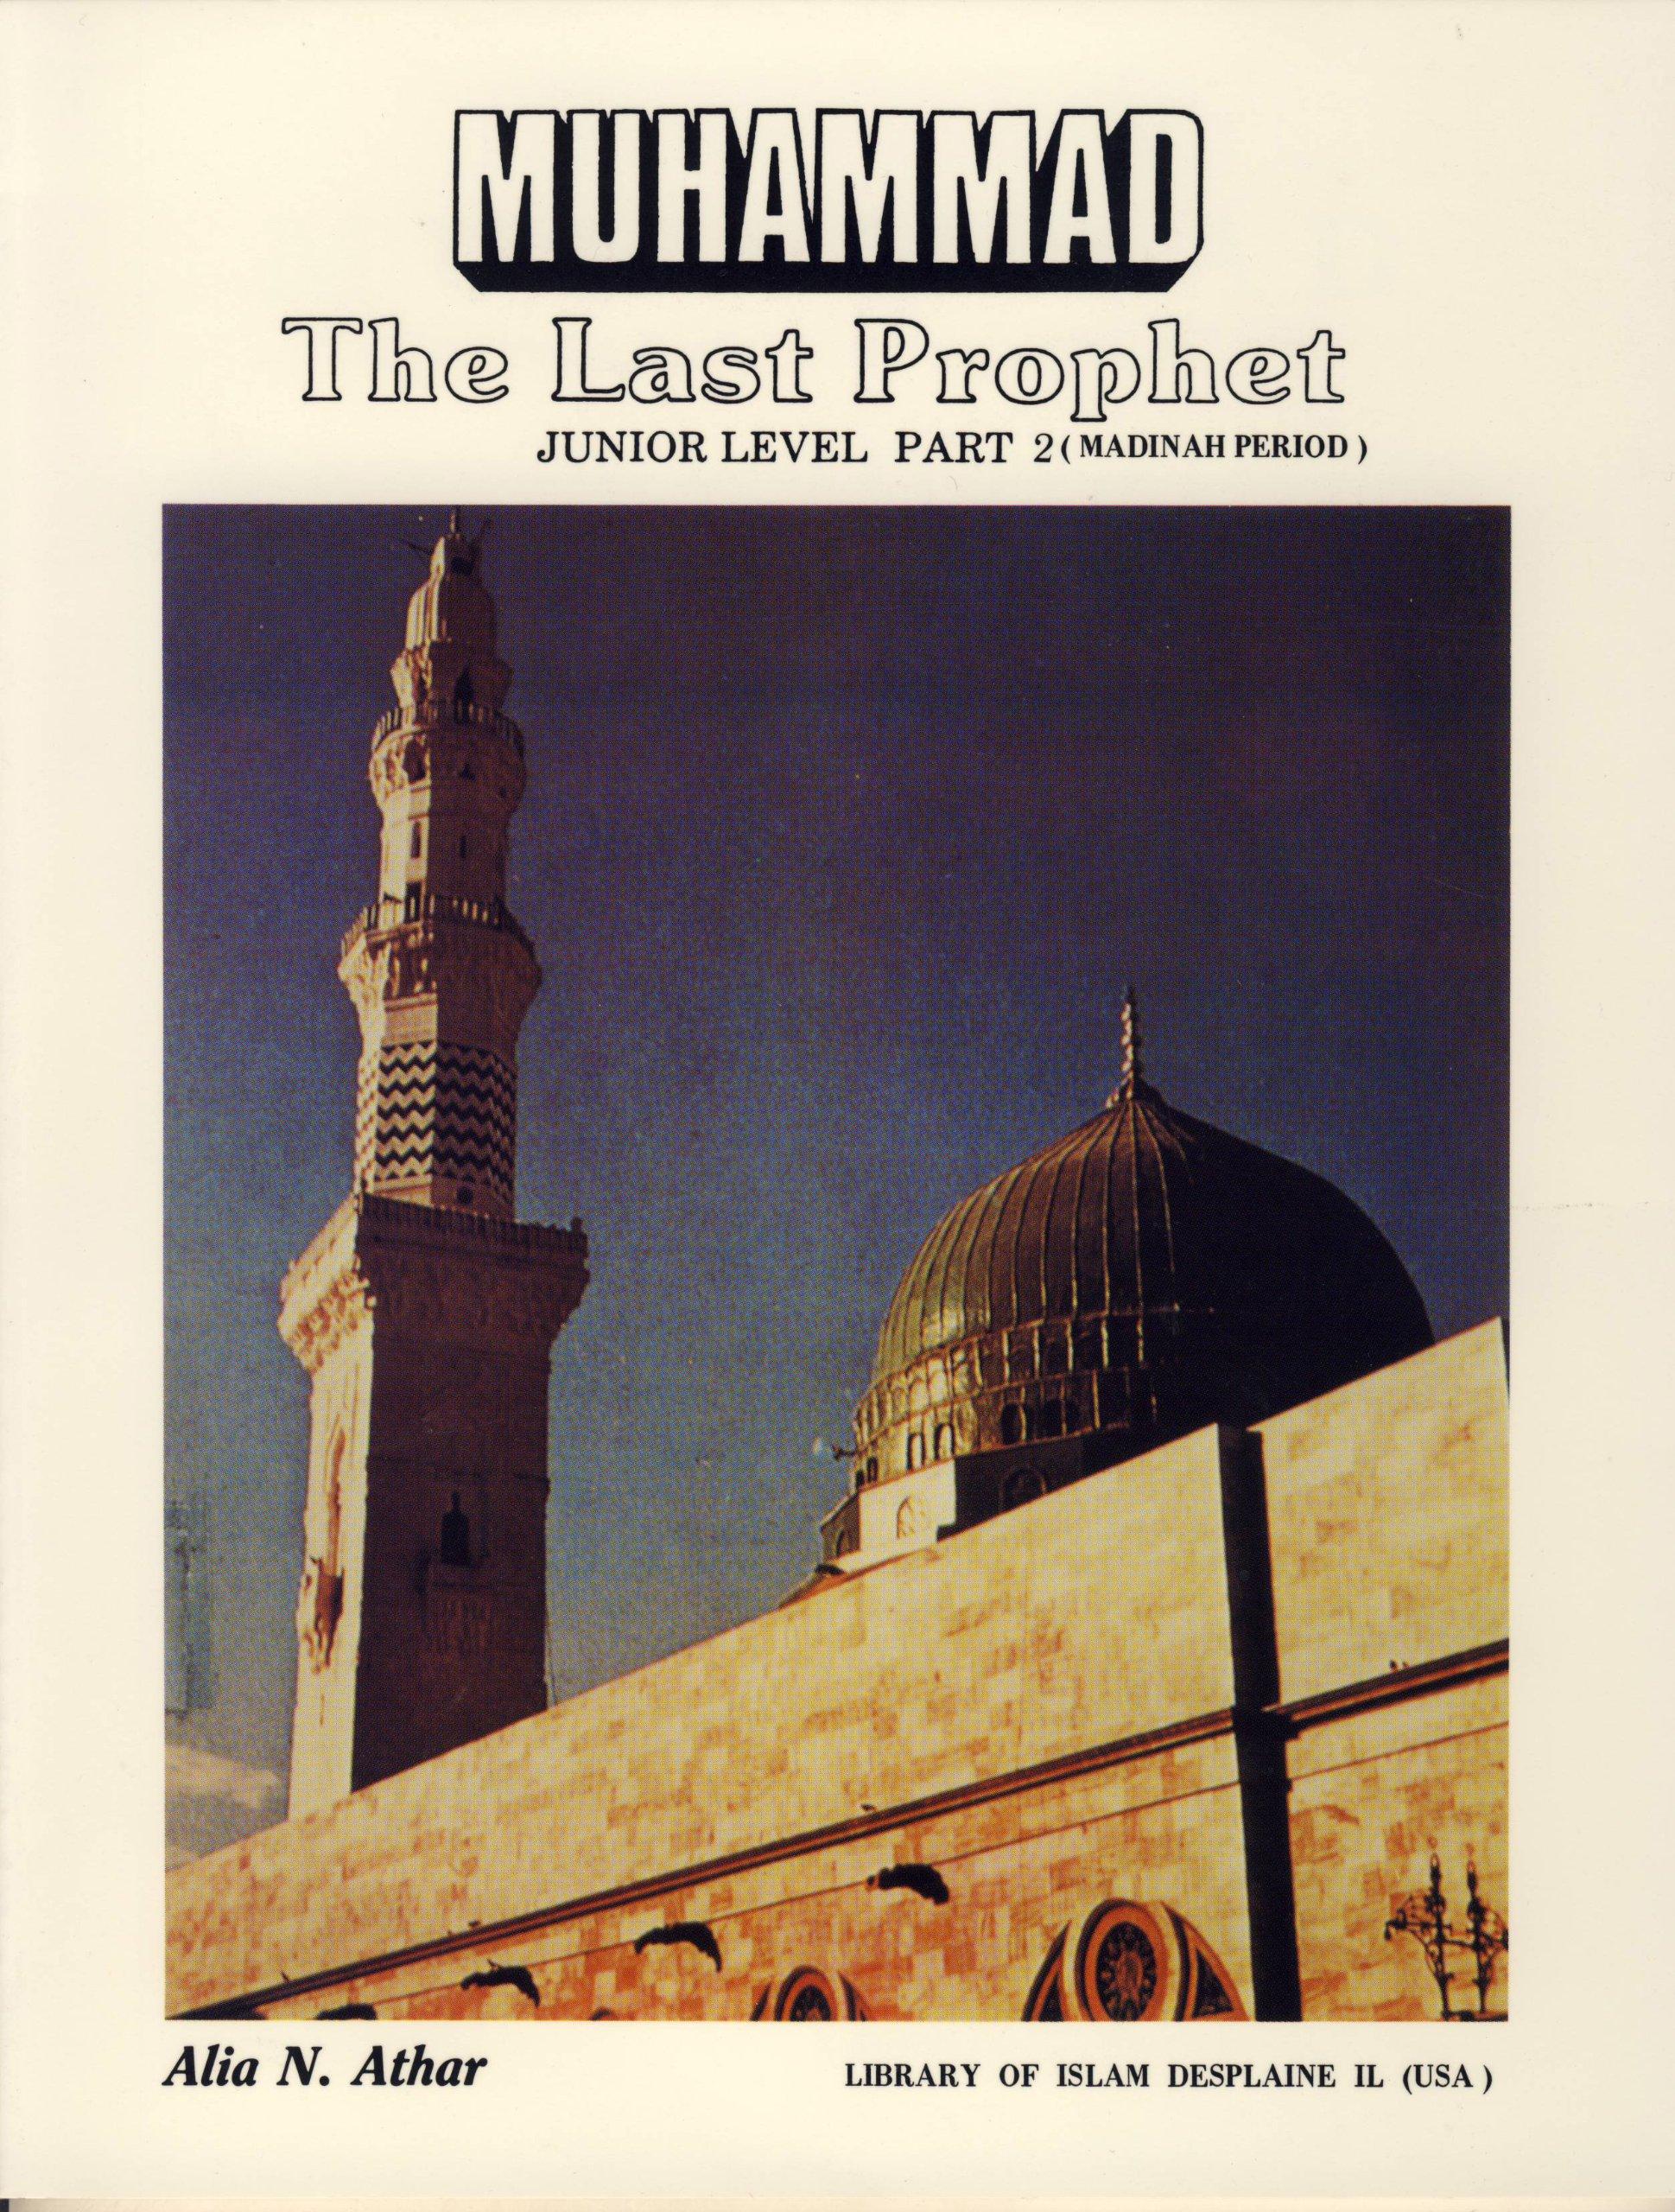 Muhammad the Last Prophet II